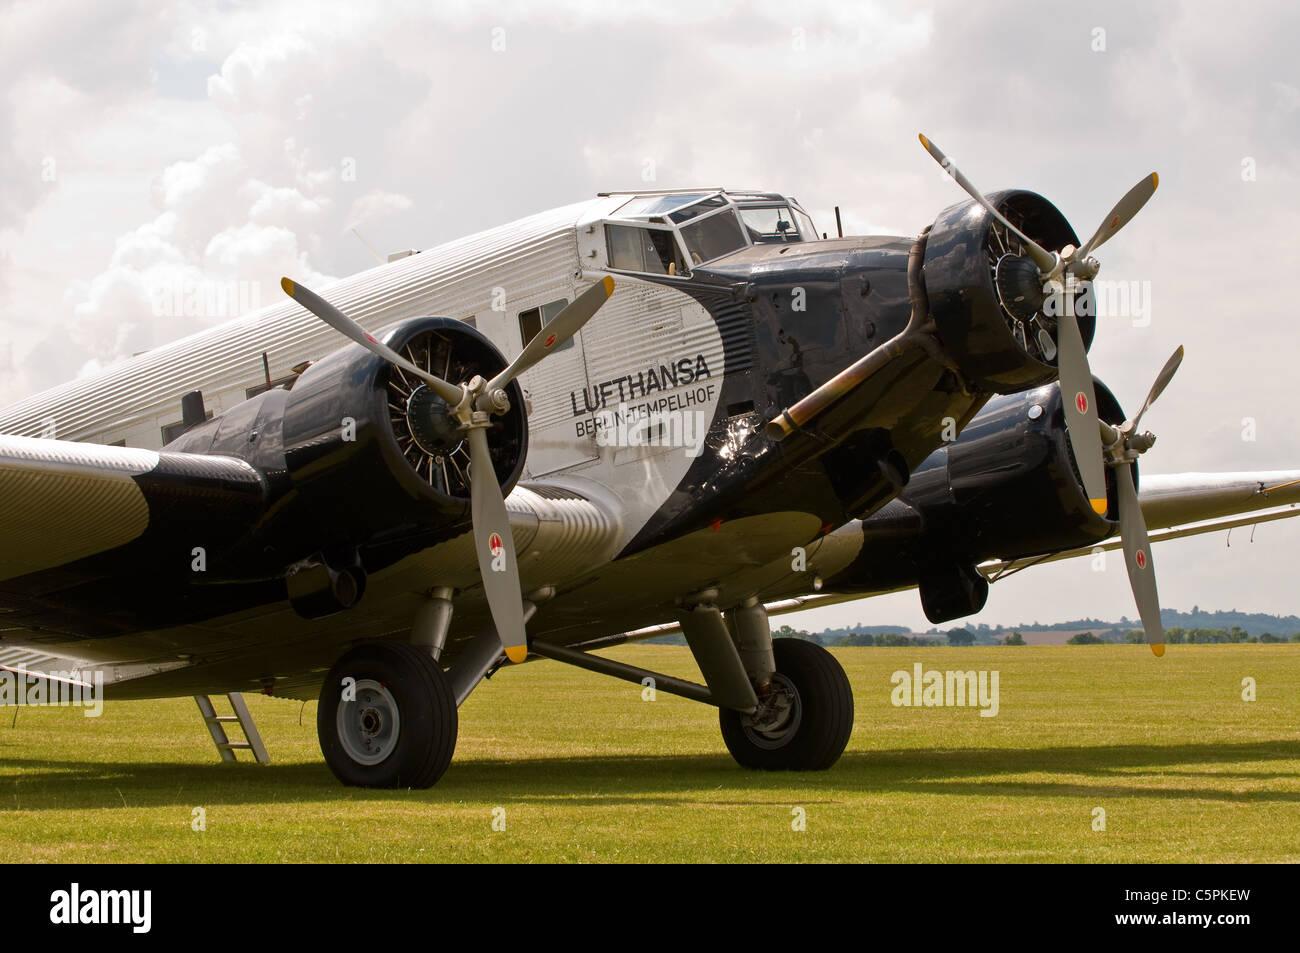 Junkers Berlin vintage aircraft junkers ju52 3m berlin tempelhof luftansa stock photo royalty free image